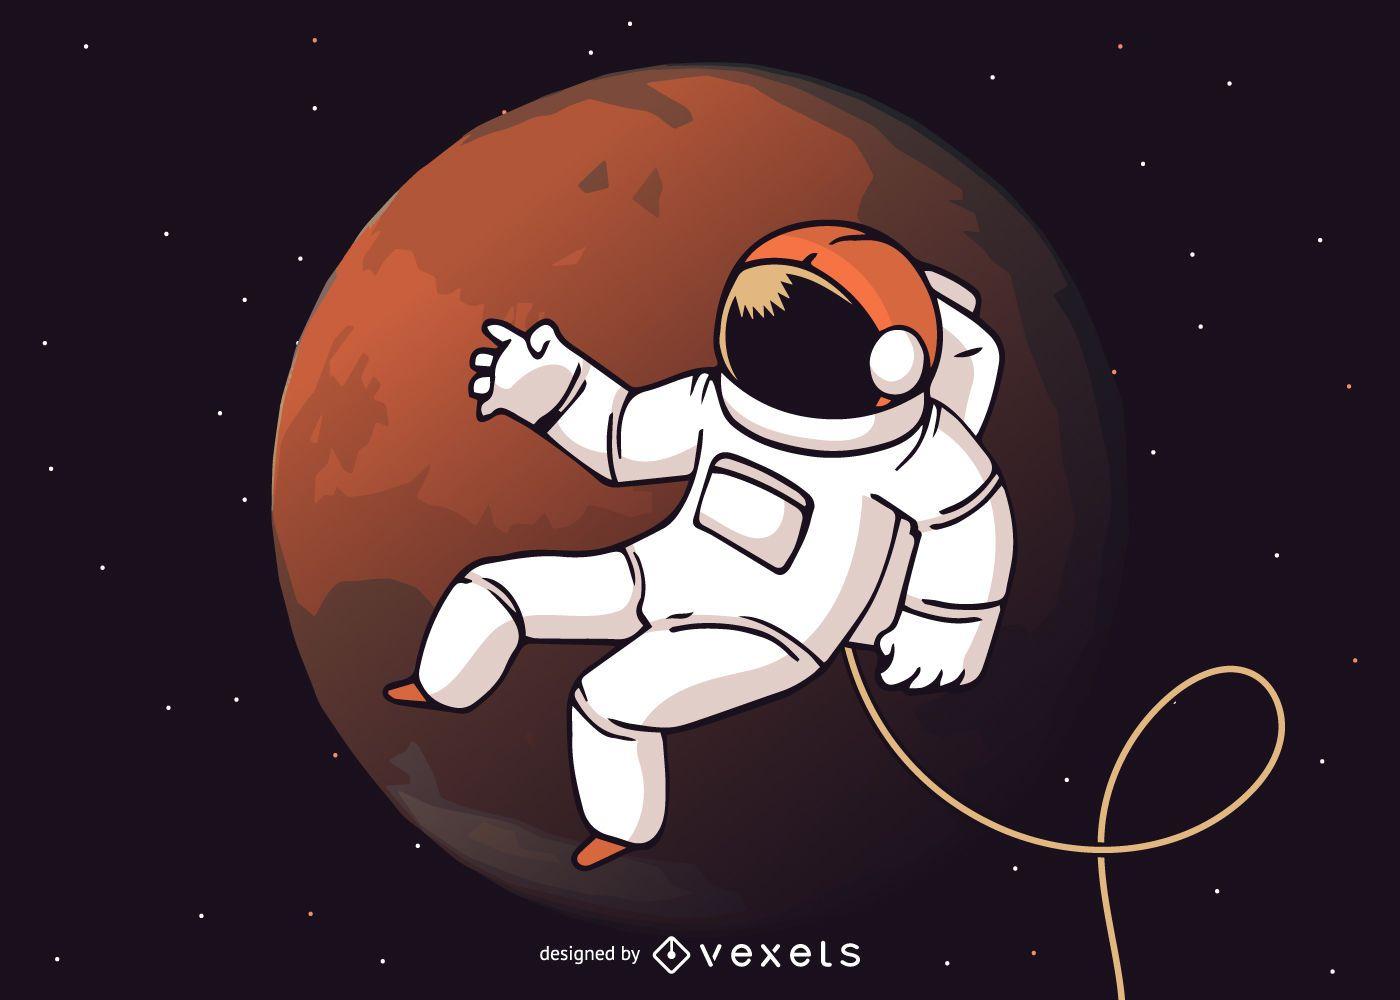 Ilustración de caminata espacial de astronauta